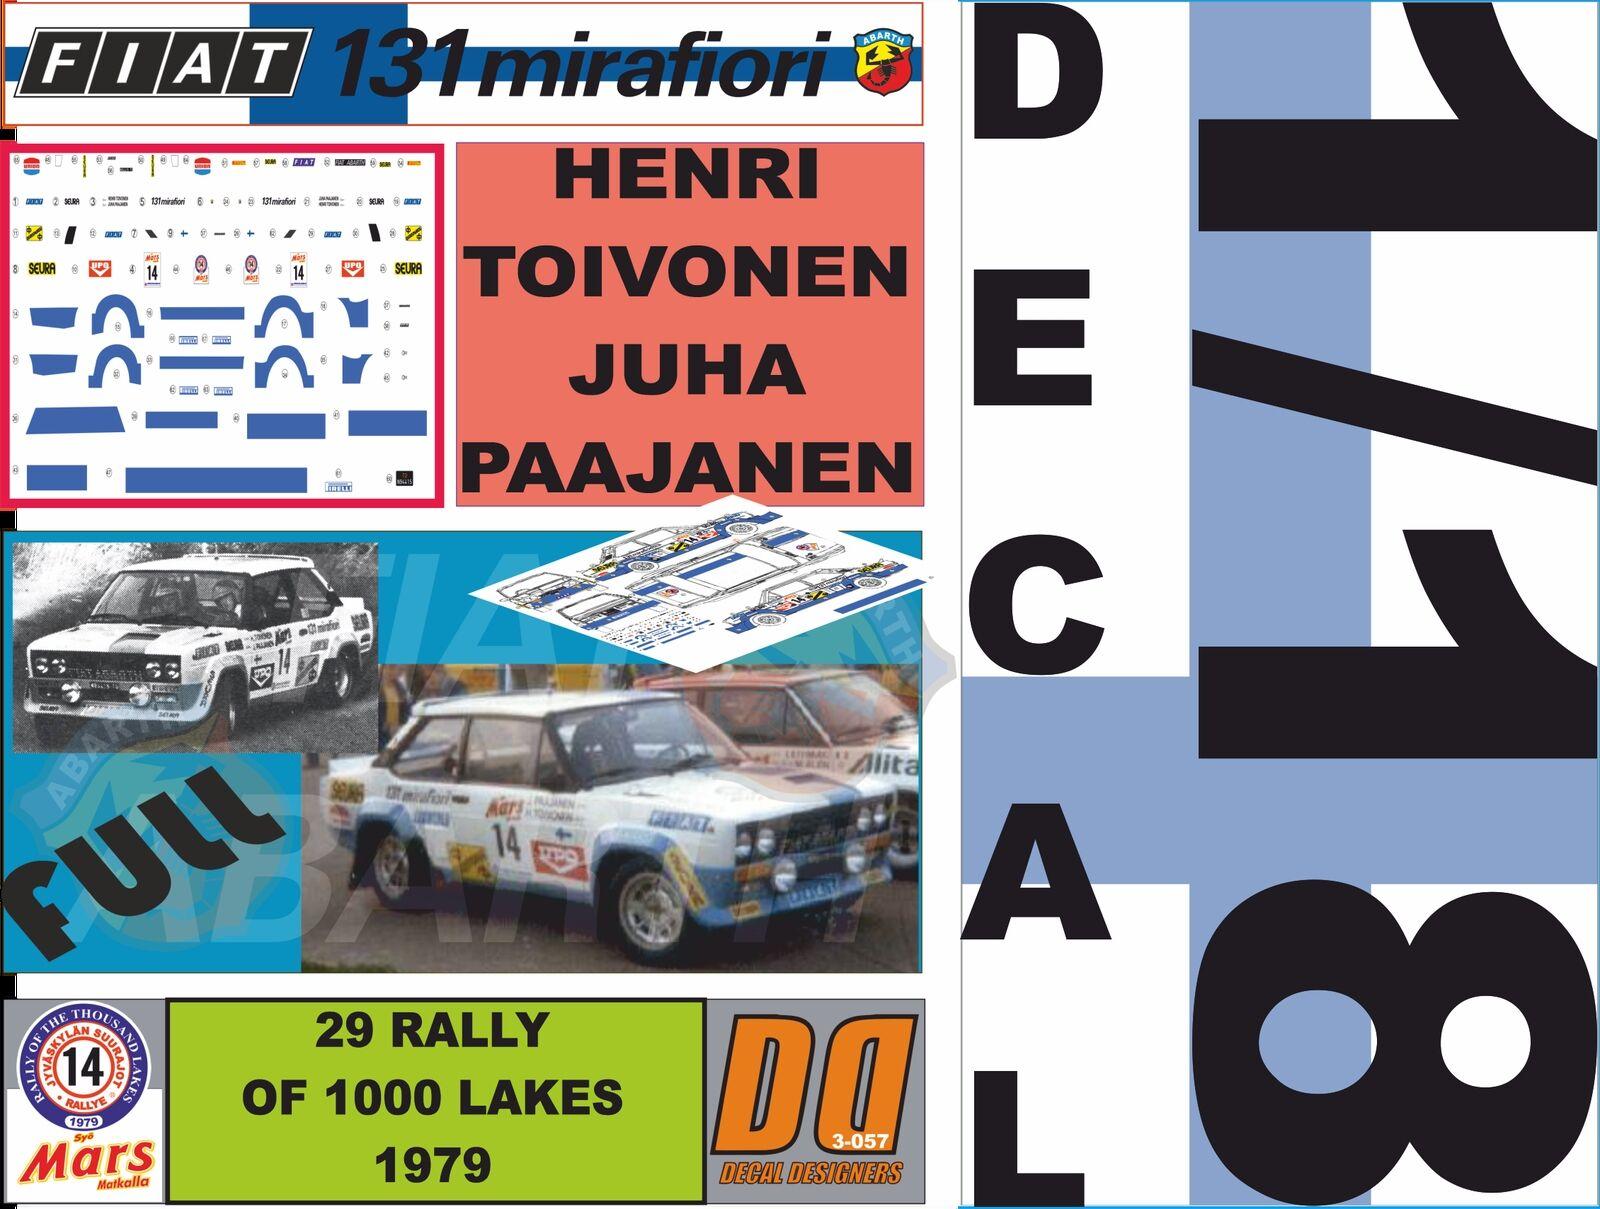 Decal 1 18 fiat 131 abarth H. TOIVONEN 1000 Lakes 1979 (Full) (04)